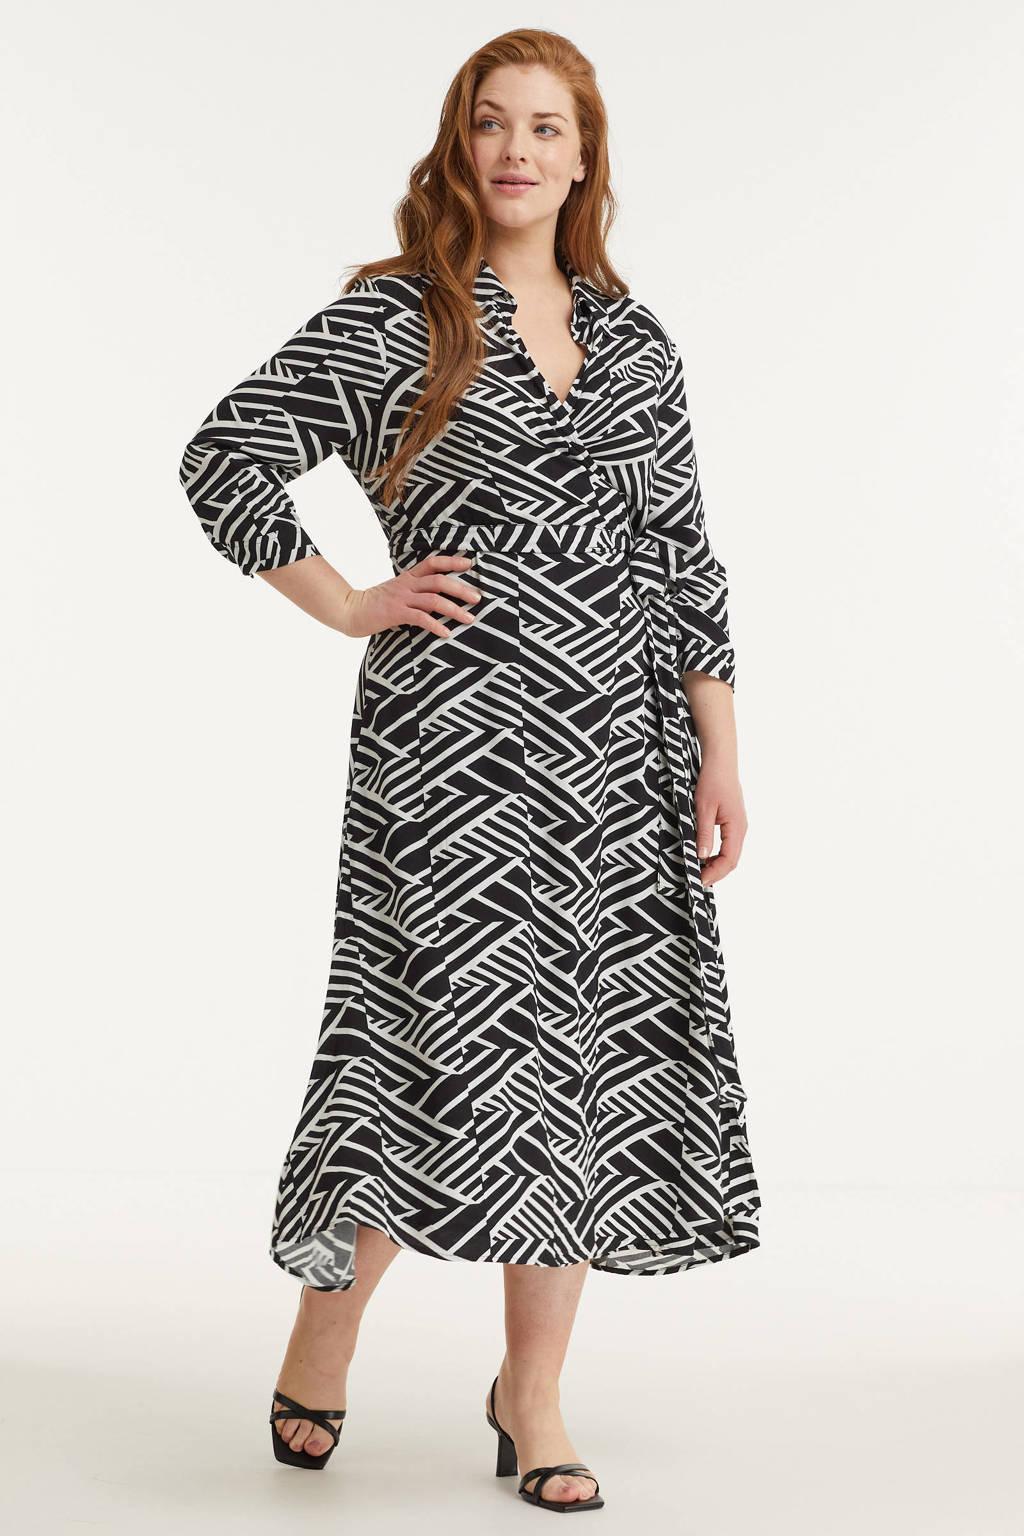 GREAT LOOKS jurk met grafische print zwart/wit, Zwart/wit